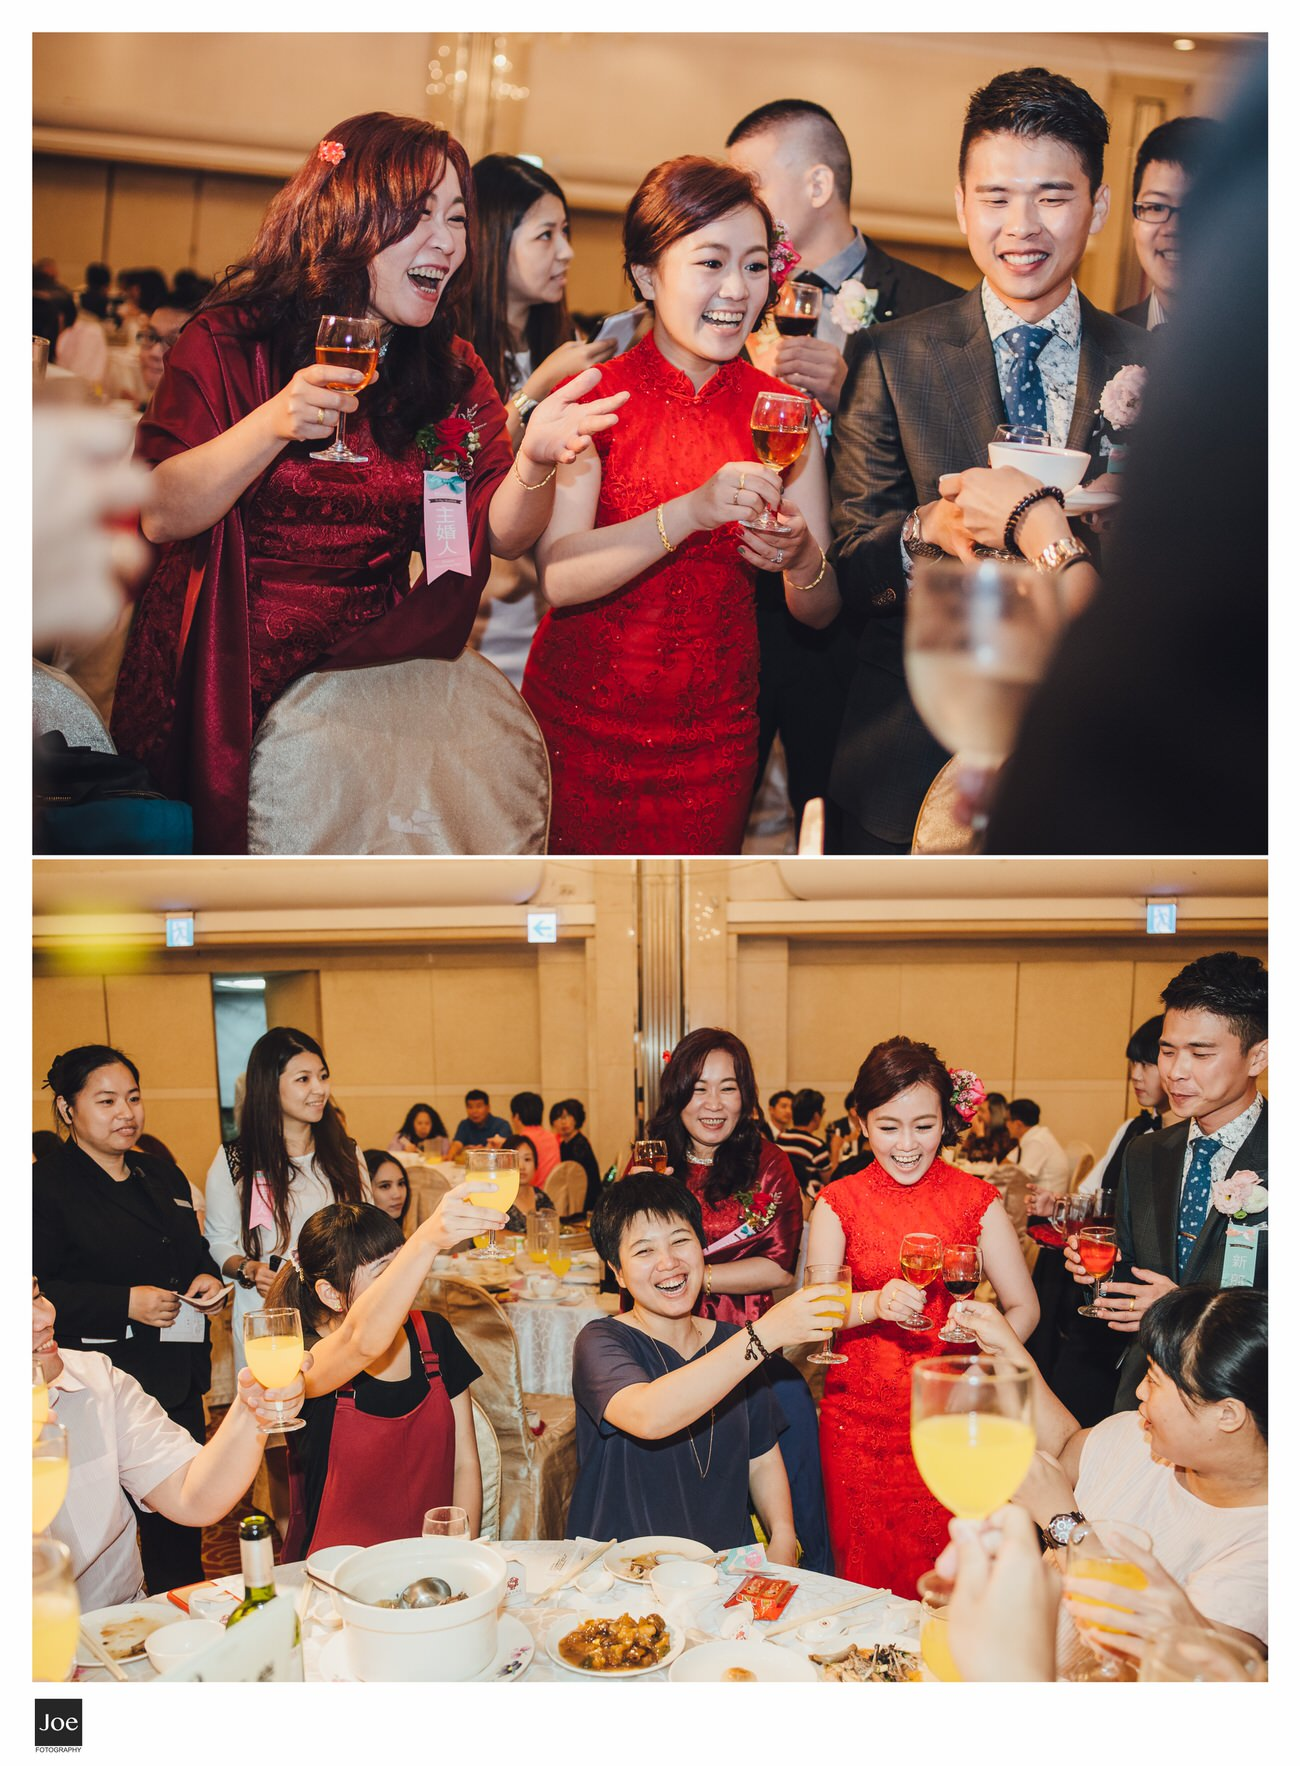 sunworld-dynasty-hotel-taipei-wedding-photo-joe-fotography-angel-jay-110.jpg